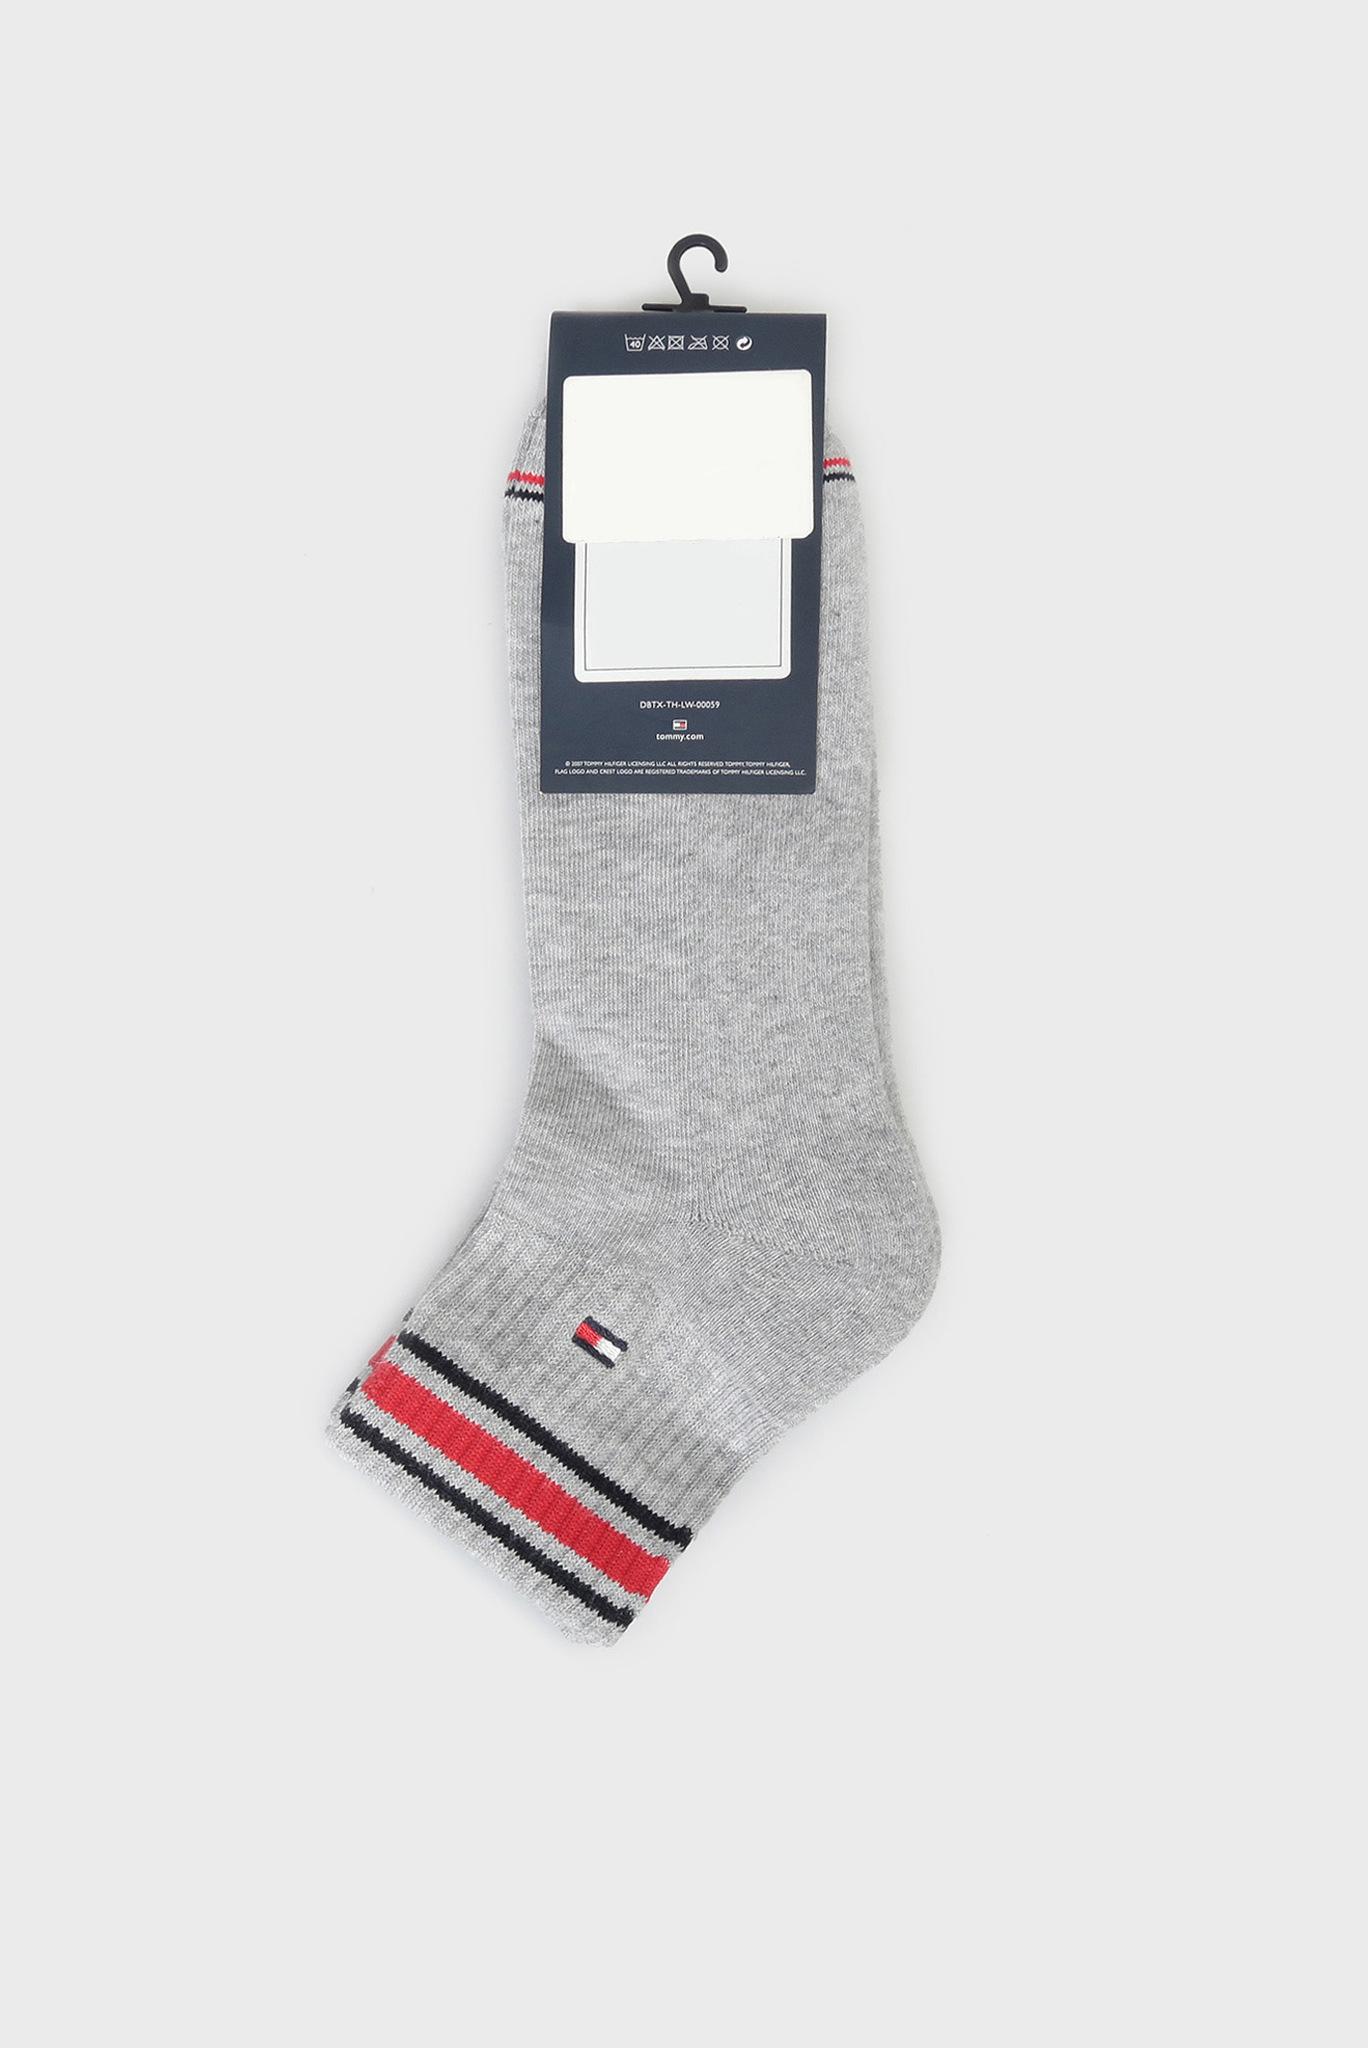 Мужские серые носки ICONIC SPORTS (2 пары) Tommy Hilfiger